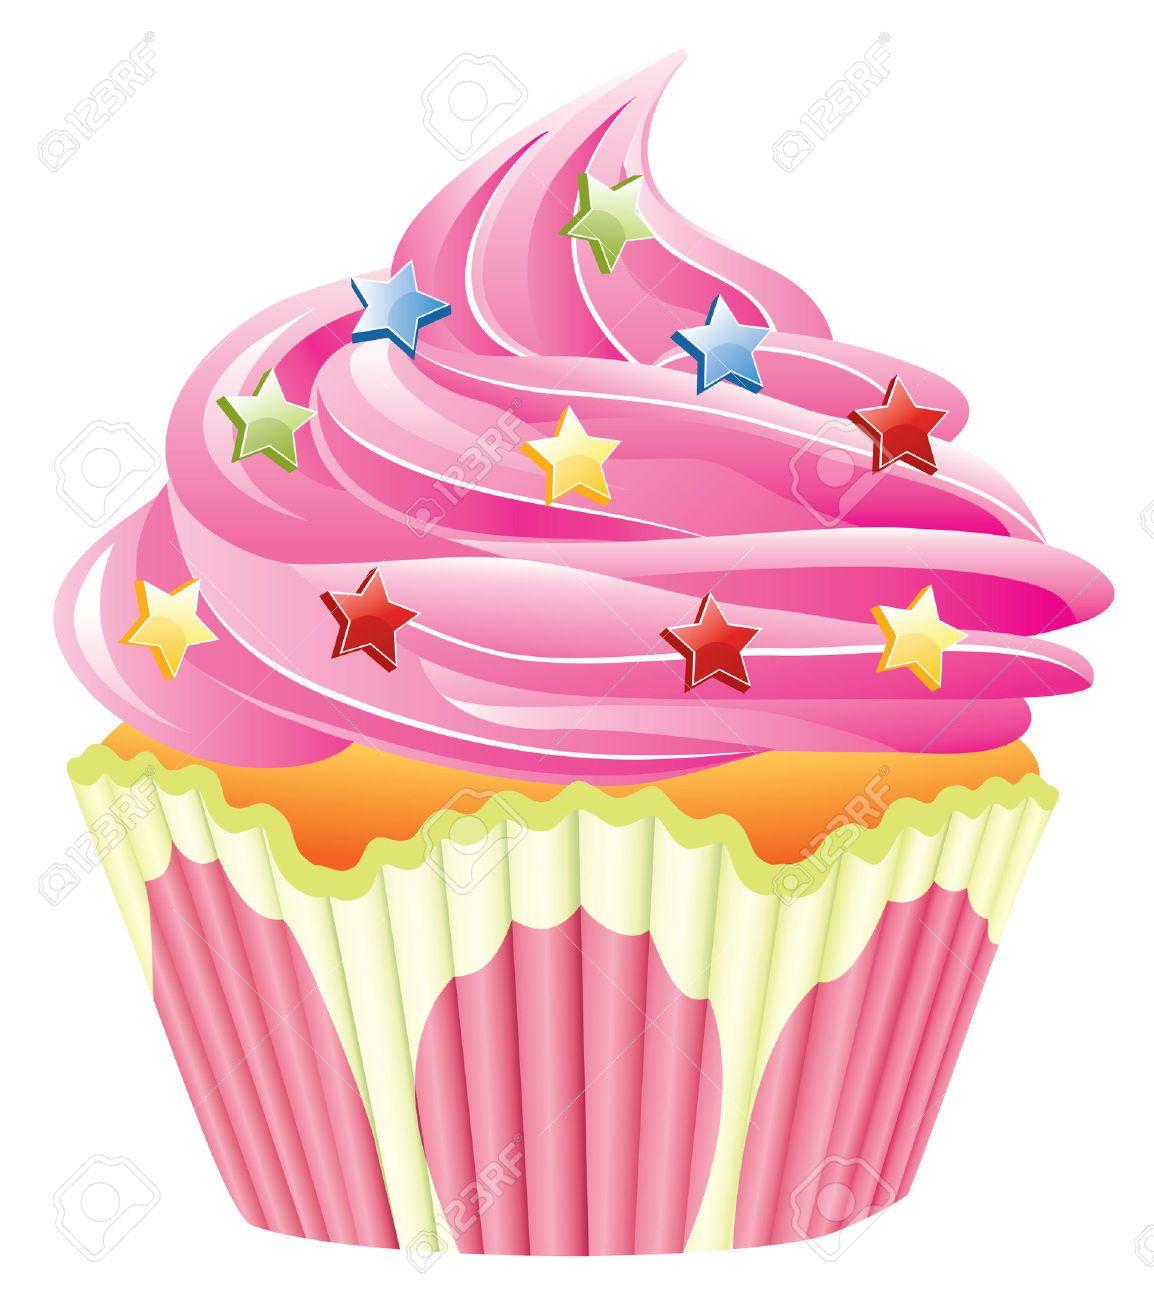 Cake clipart cupcake. Sprinkles jpg cliparts pinterest